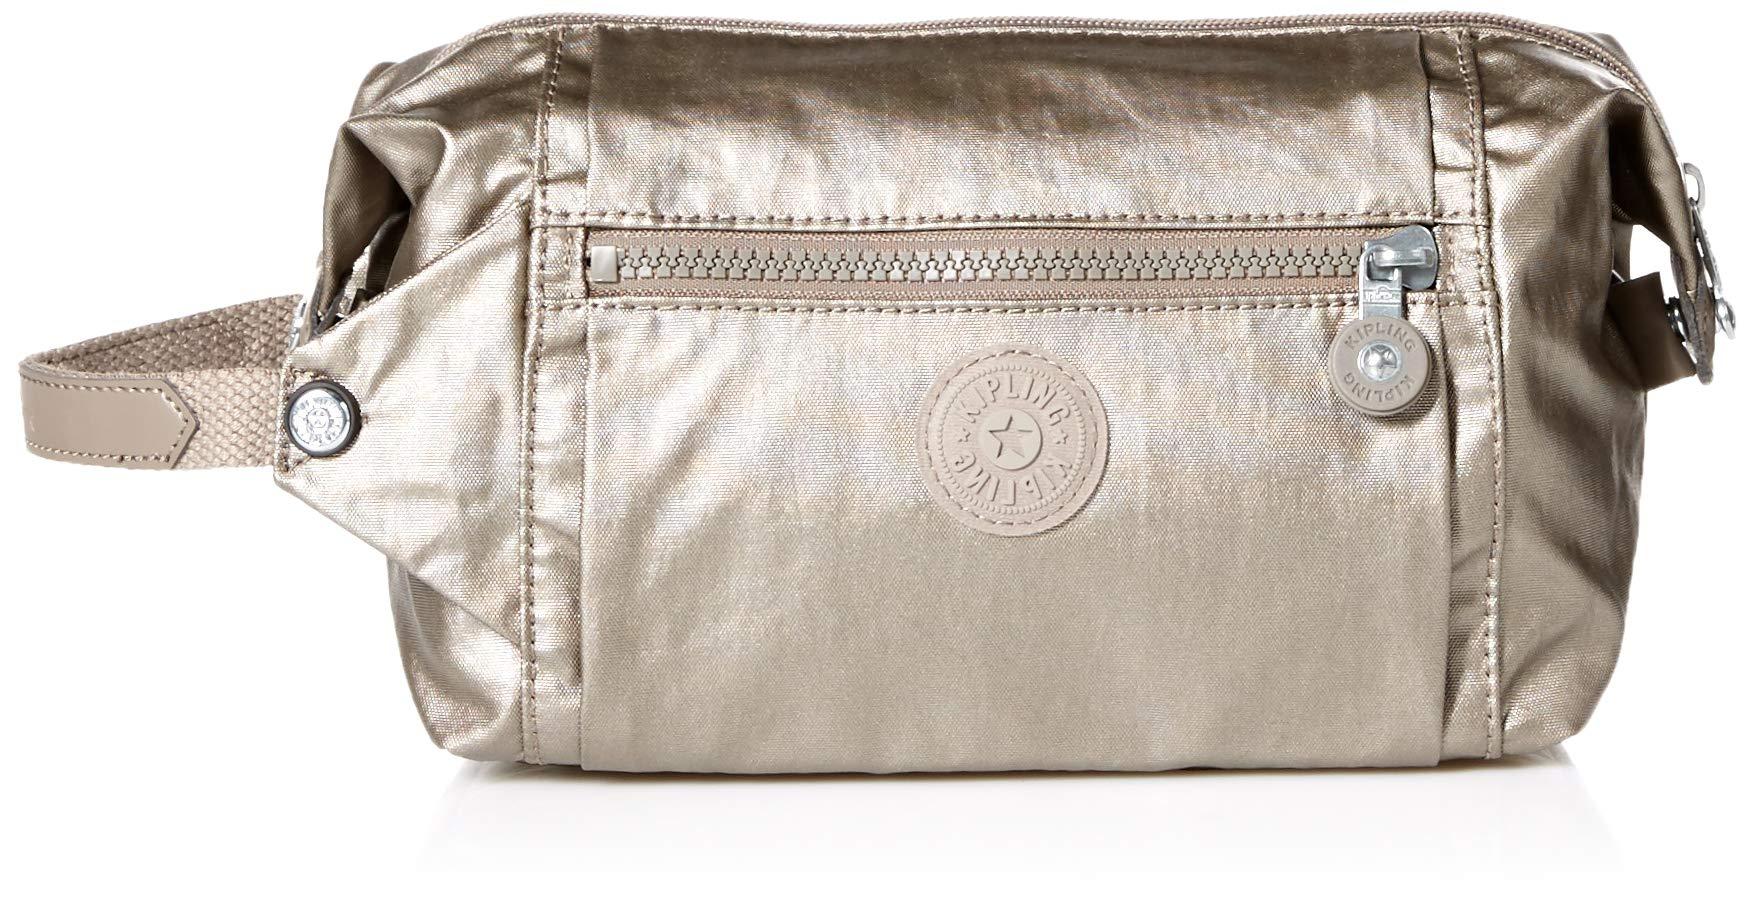 Kipling Women's Aiden Toiletry, Essential Travel Bag, Zip Closure, metallic pewter